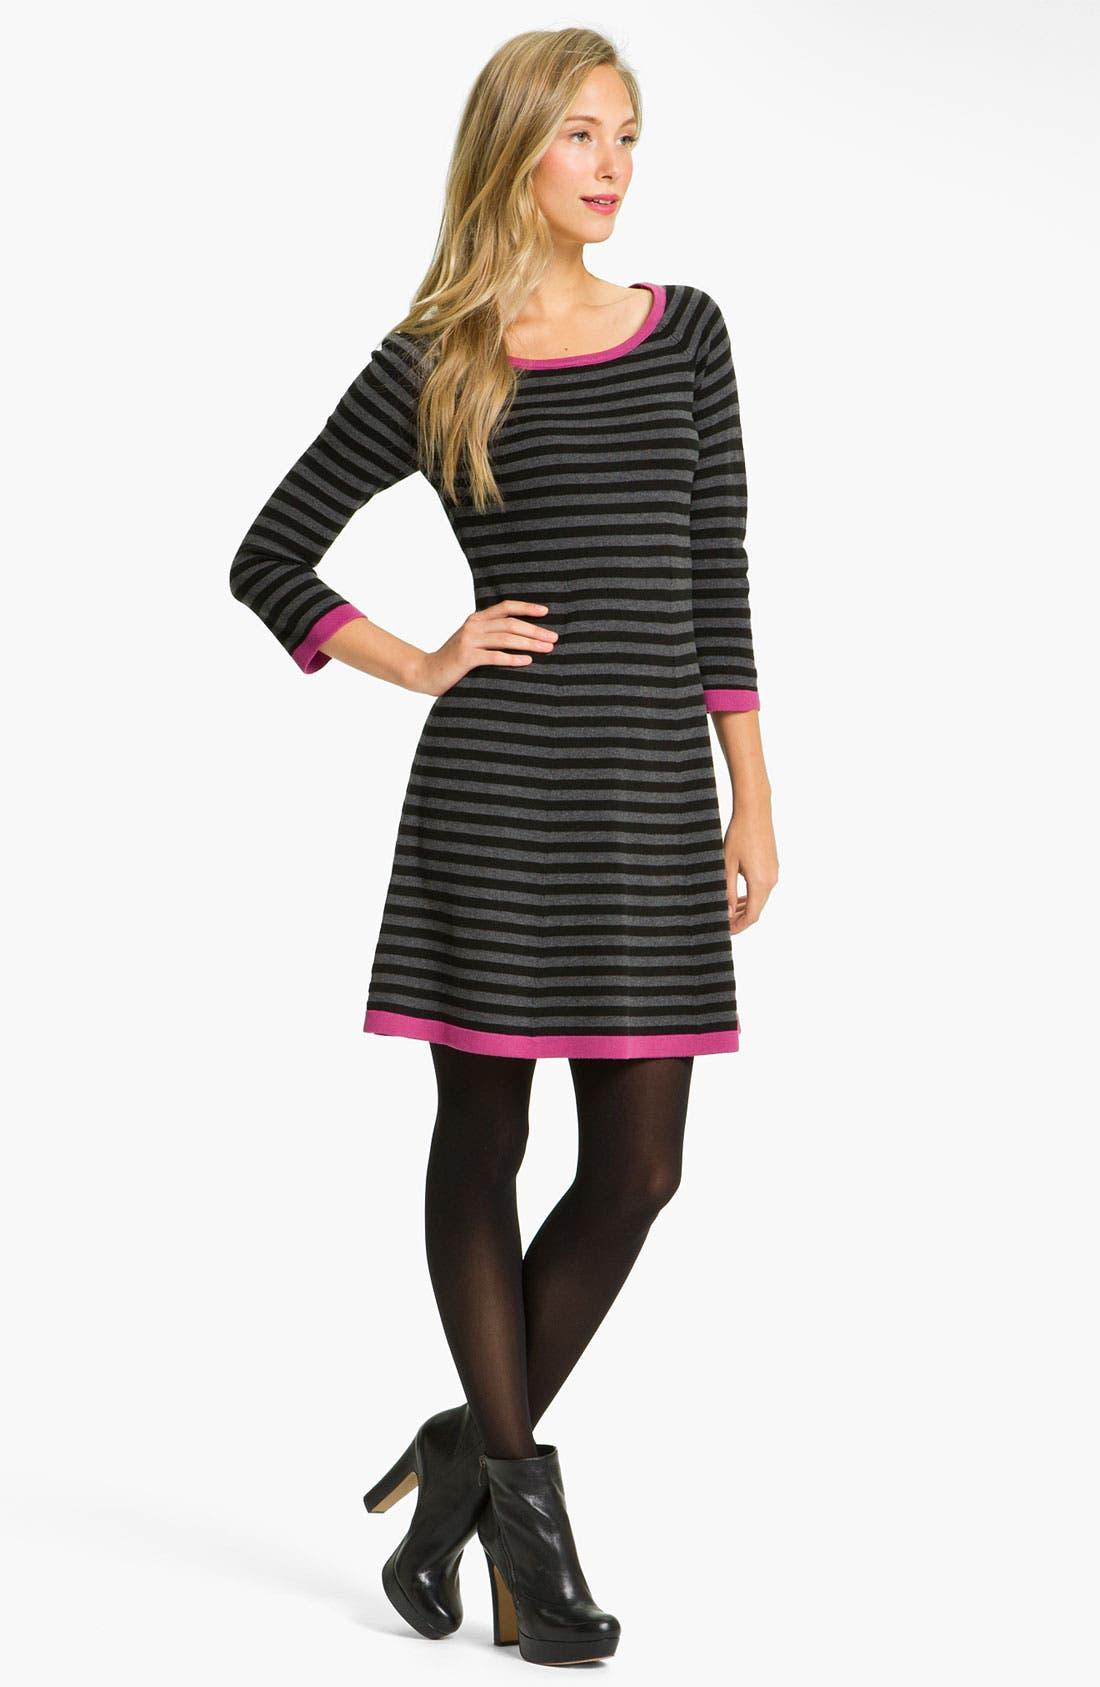 Alternate Image 1 Selected - Eliza J Stripe Contrast Trim Sweater Dress